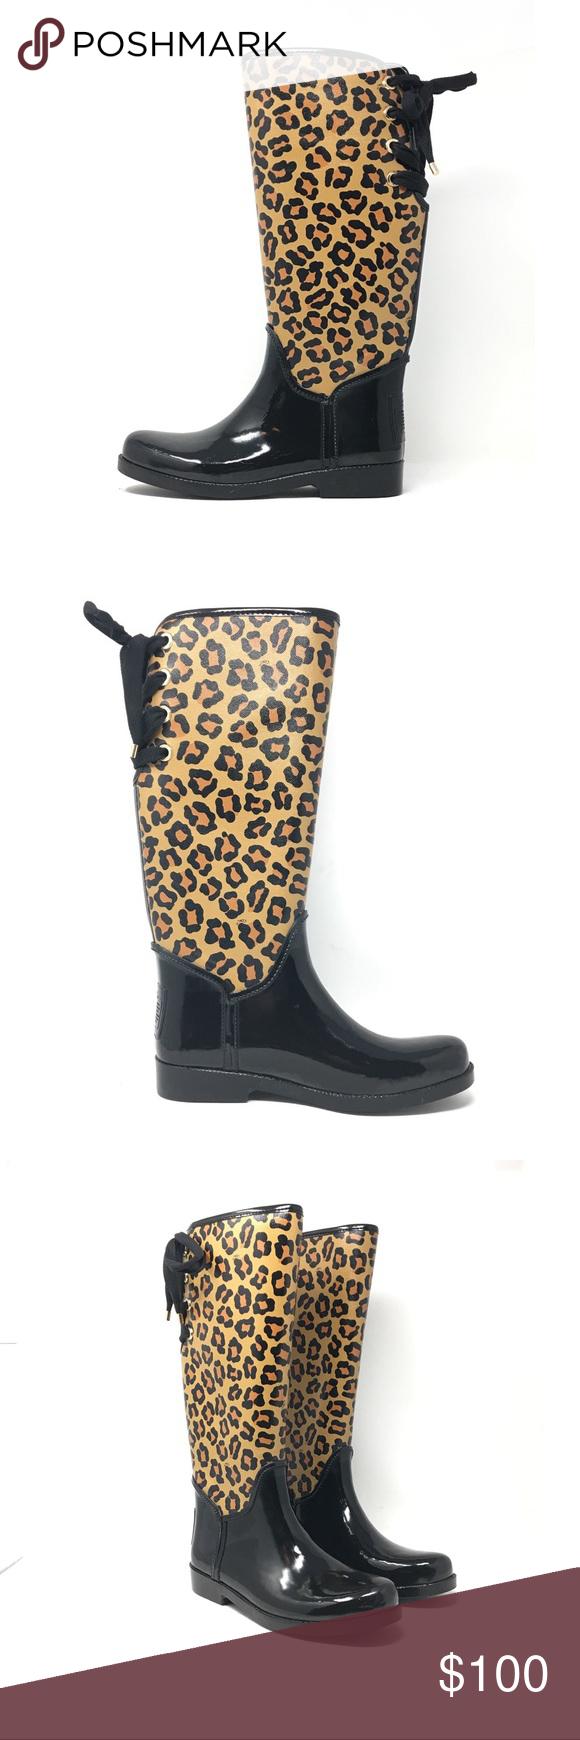 coach leopard rain boots